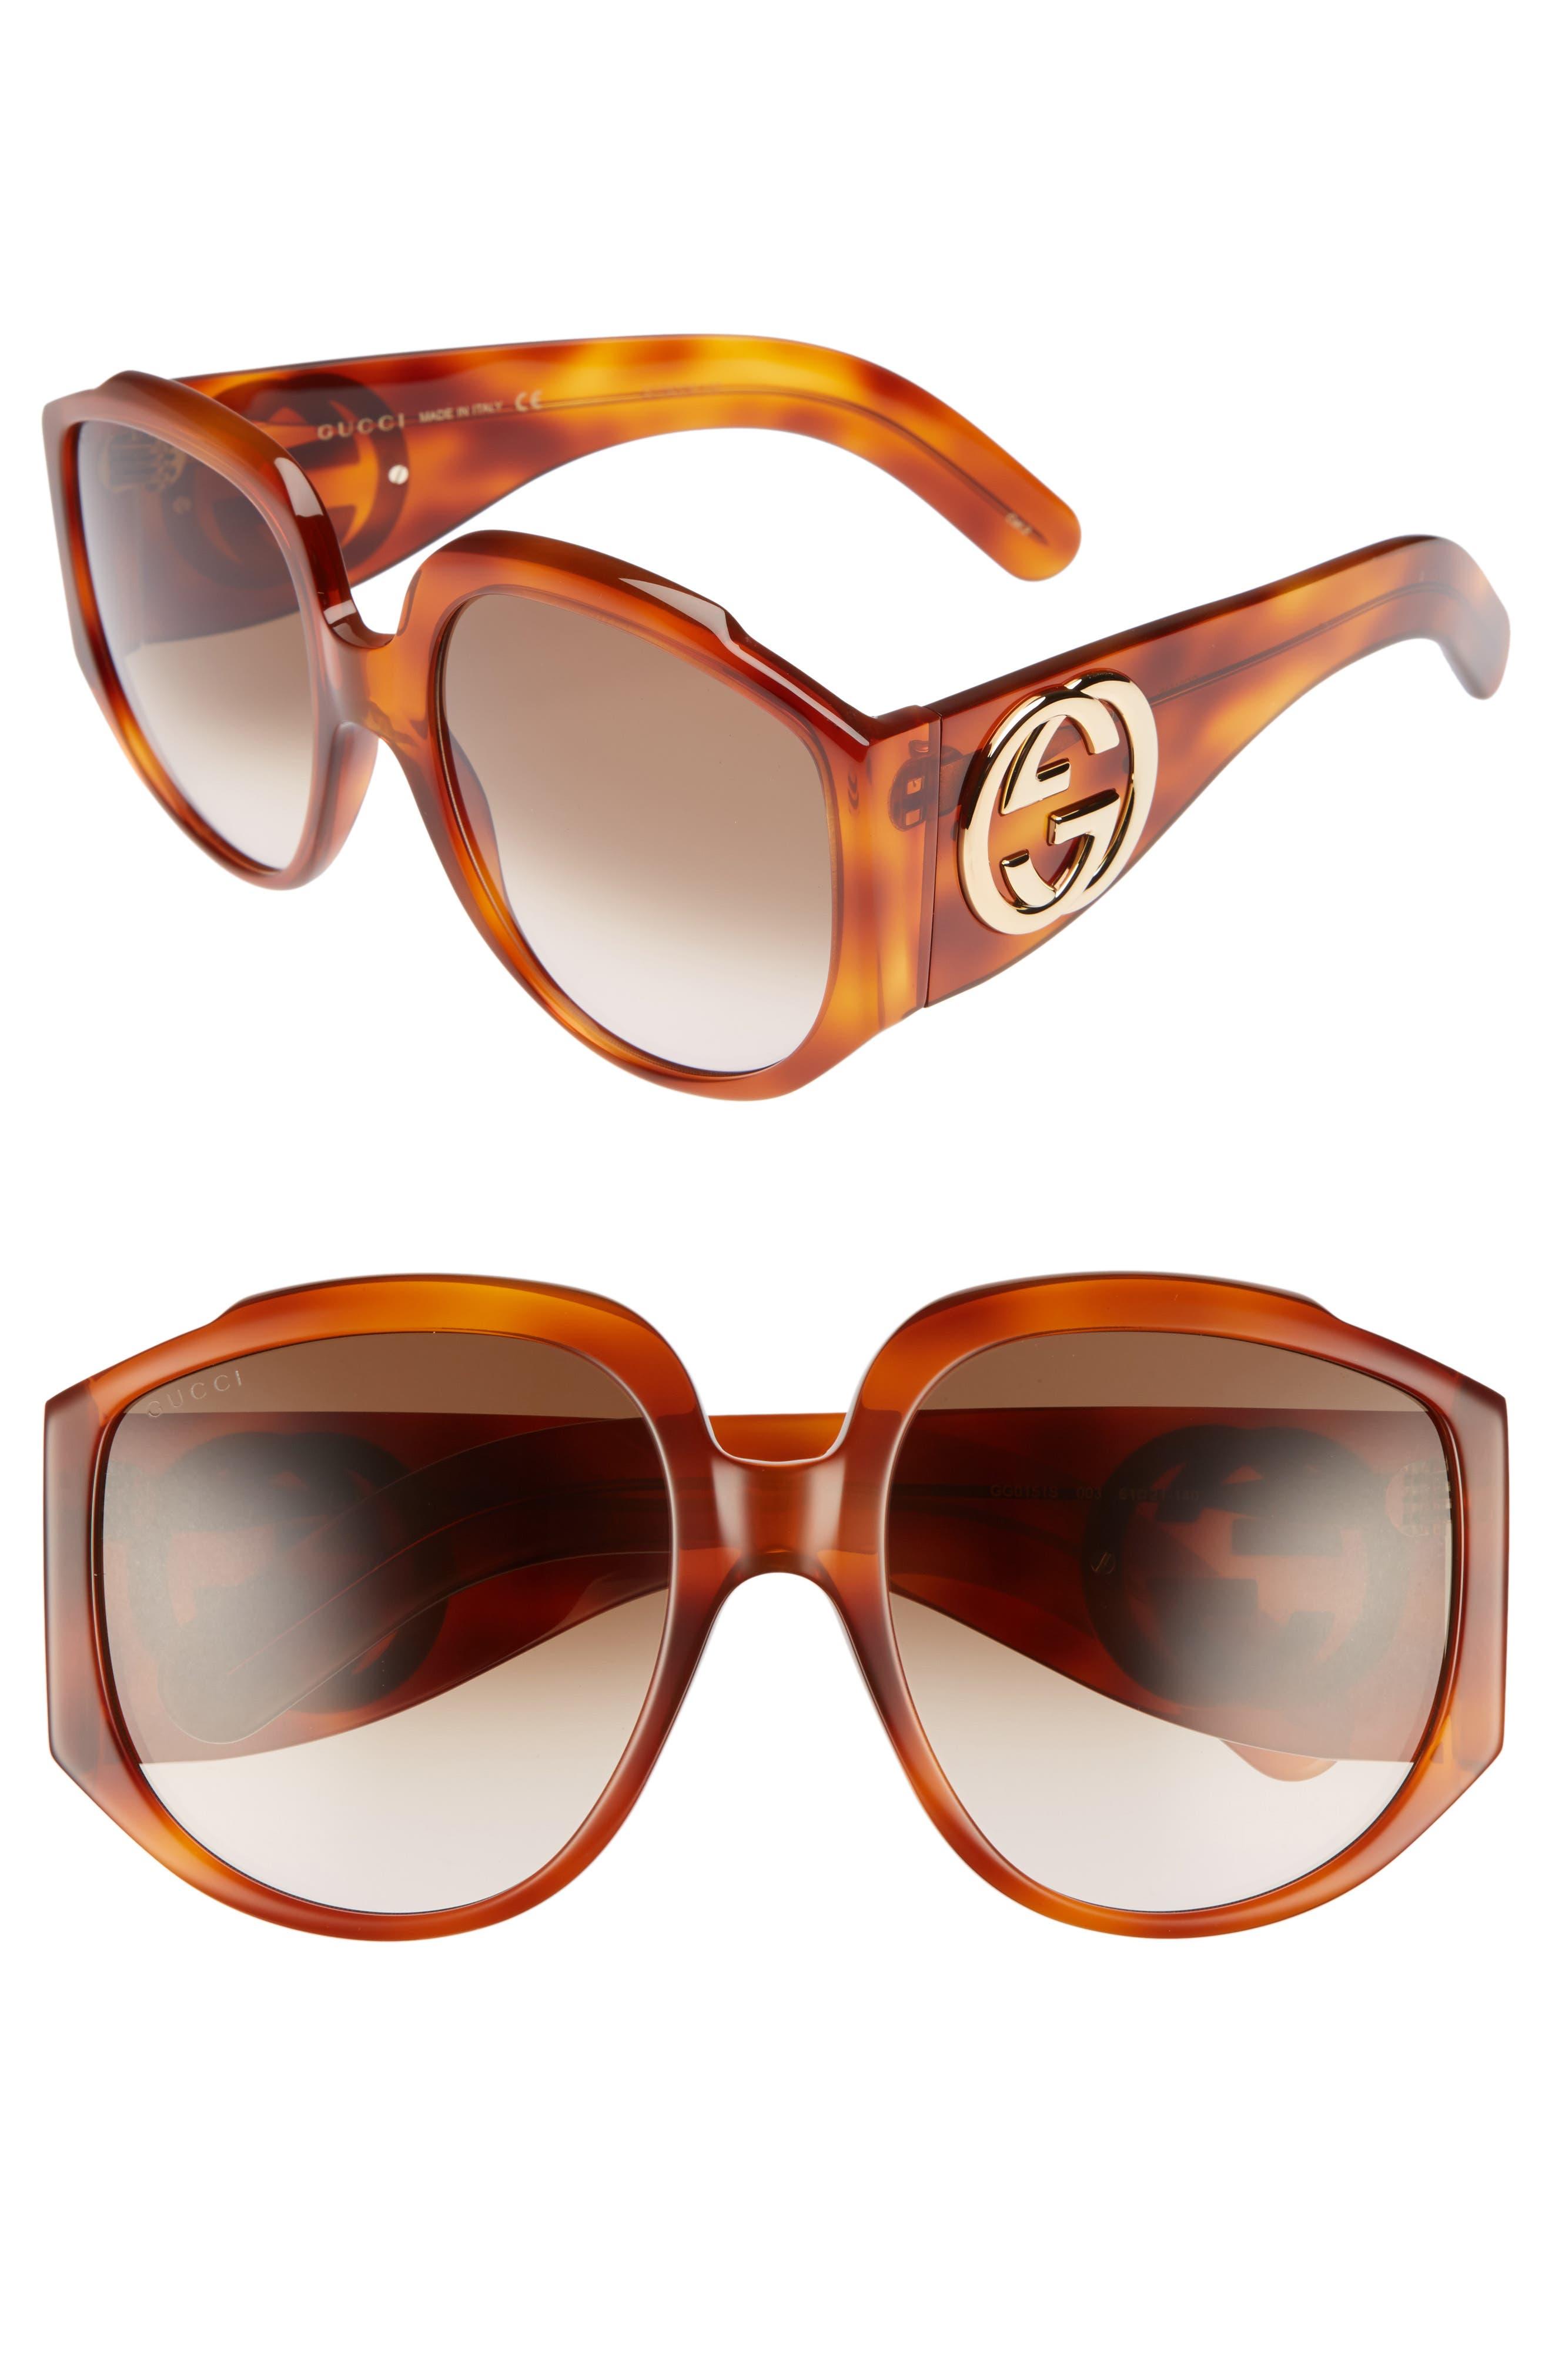 5ab2309b8f7be Gucci Wayfarer Sunglasses Light Brown Black – Southern California ...